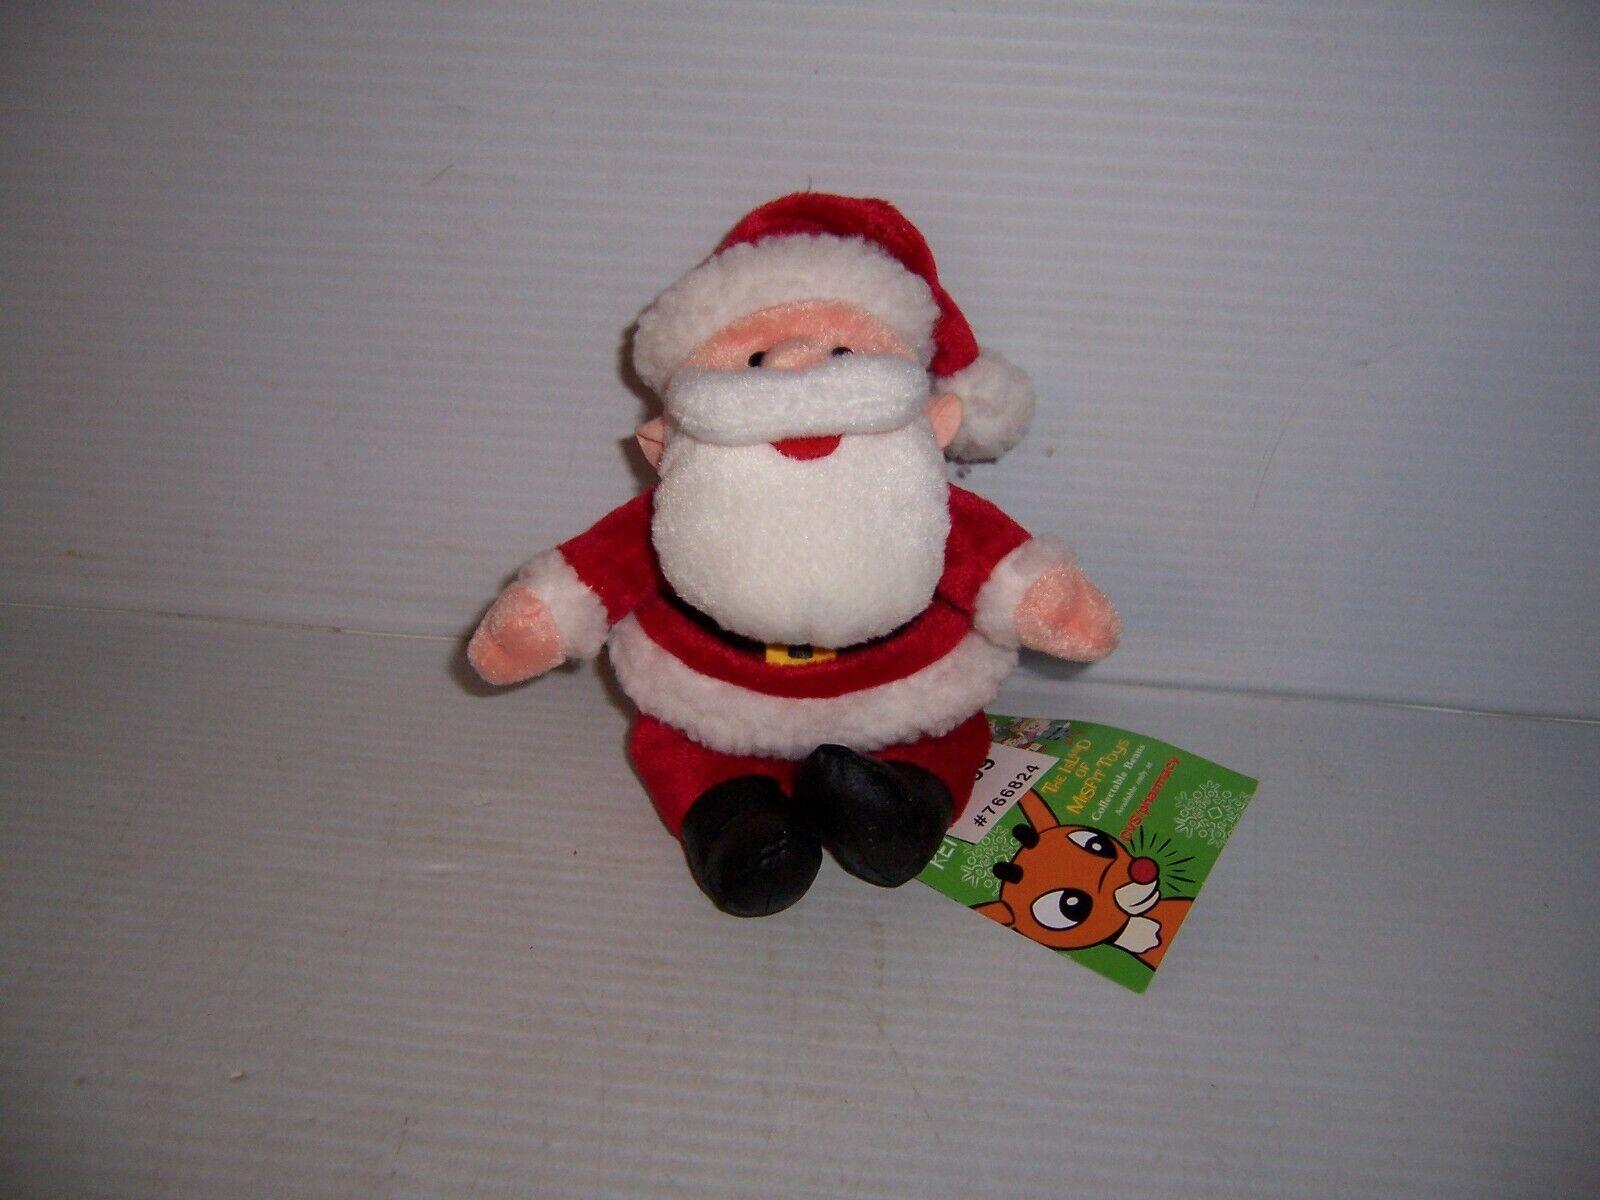 1998 Stuffins CVS Rudolph Island of Misfit Toys Santa Claus 7  Plush NWT